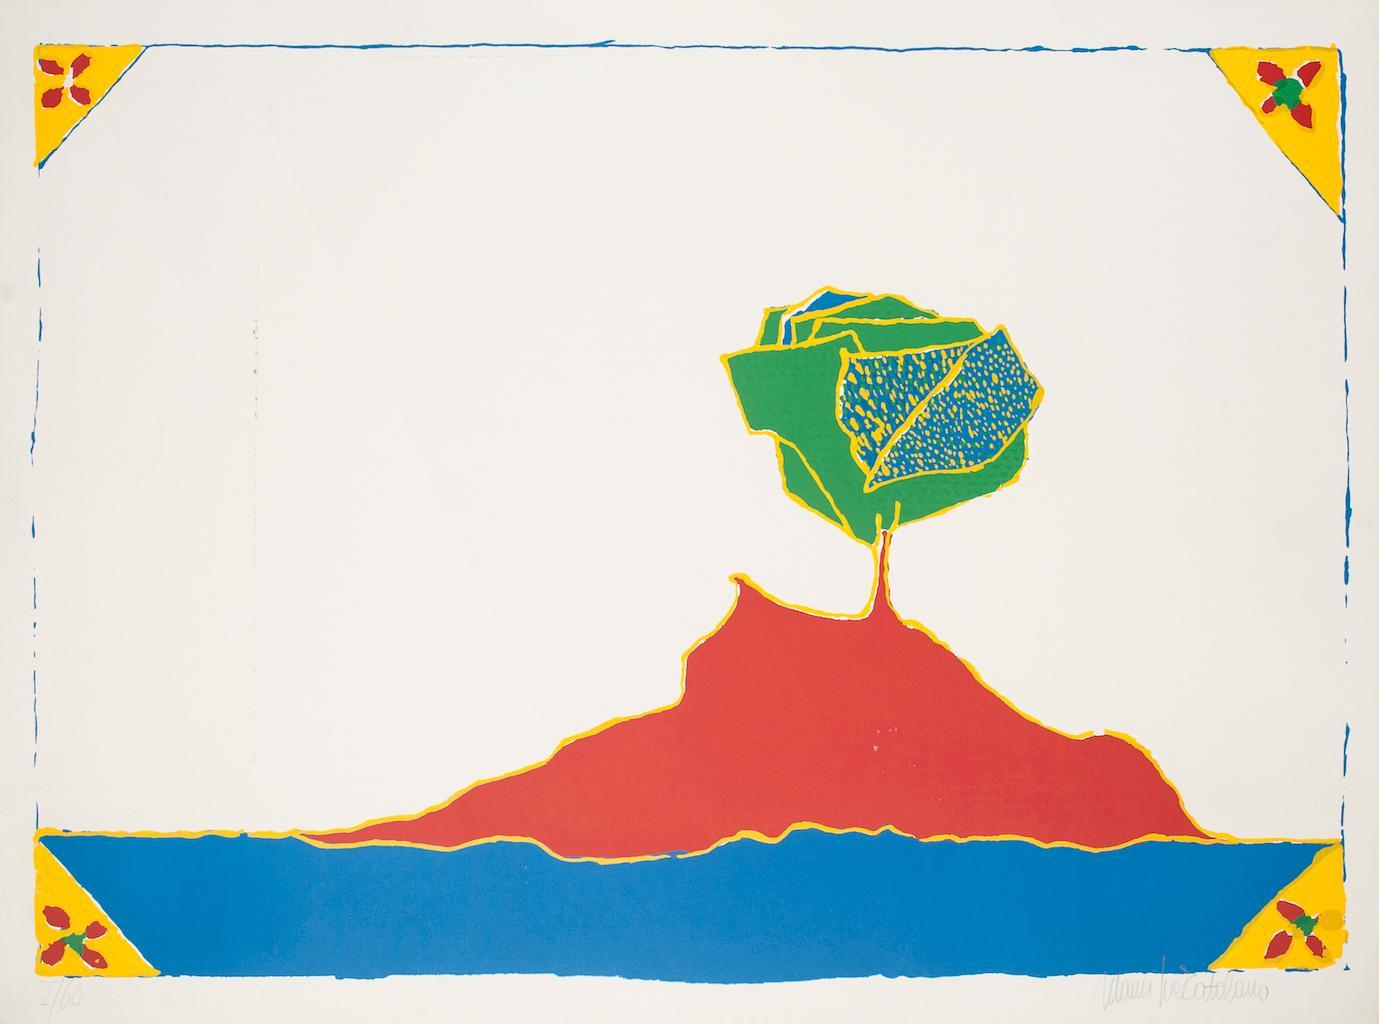 Island - Original Screen Print by Maurilio Catalano - 1970s